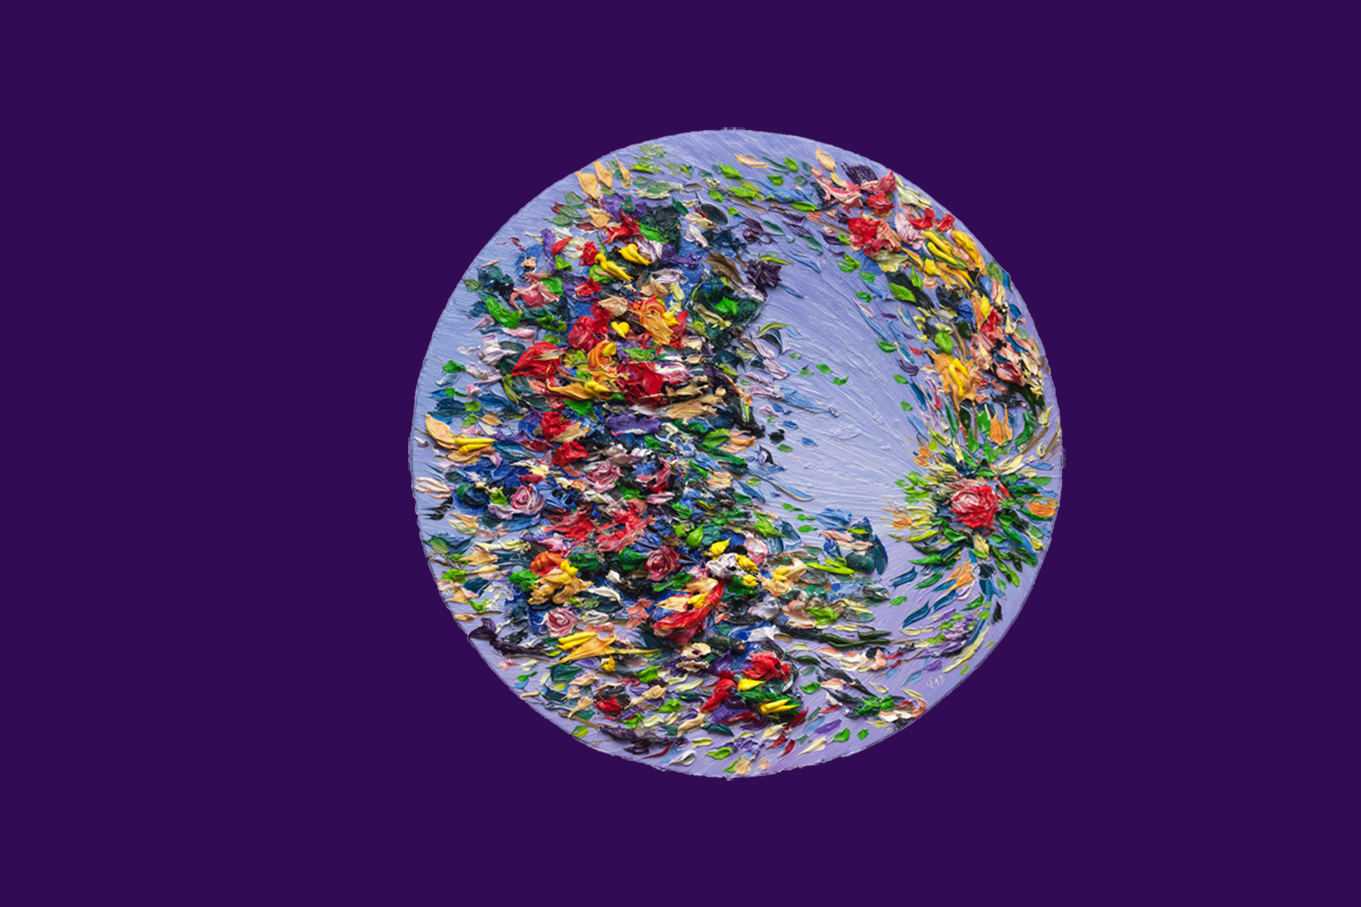 Mondblüten 10, oil on canvas, 110 cm (diameter), 2017